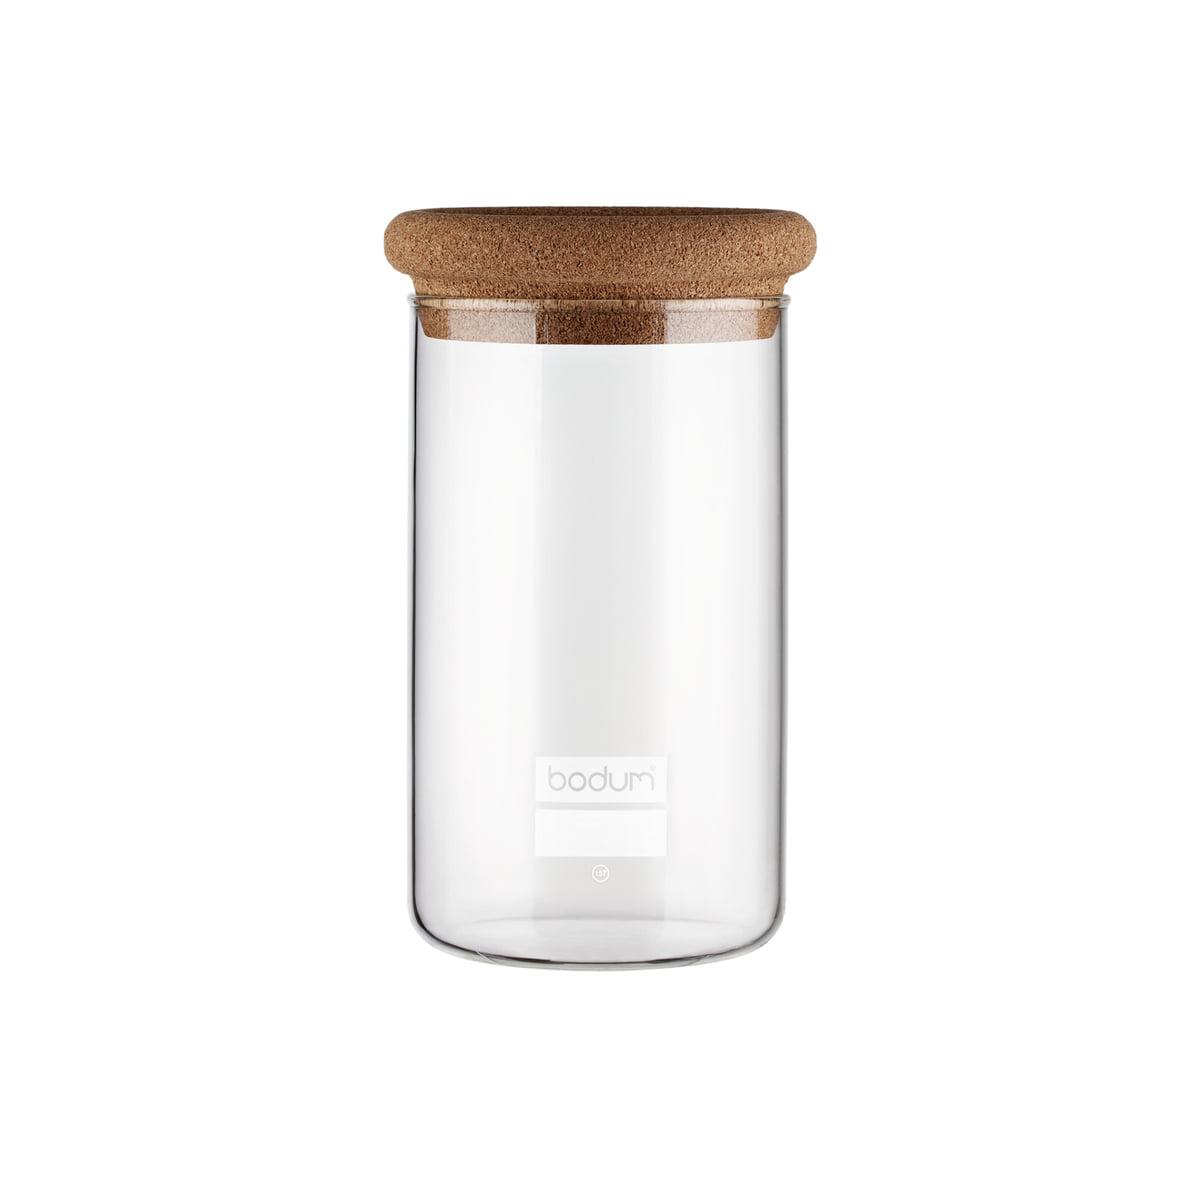 Bodum - Yohki Vorratsglas, 1 l mit Korkdeckel